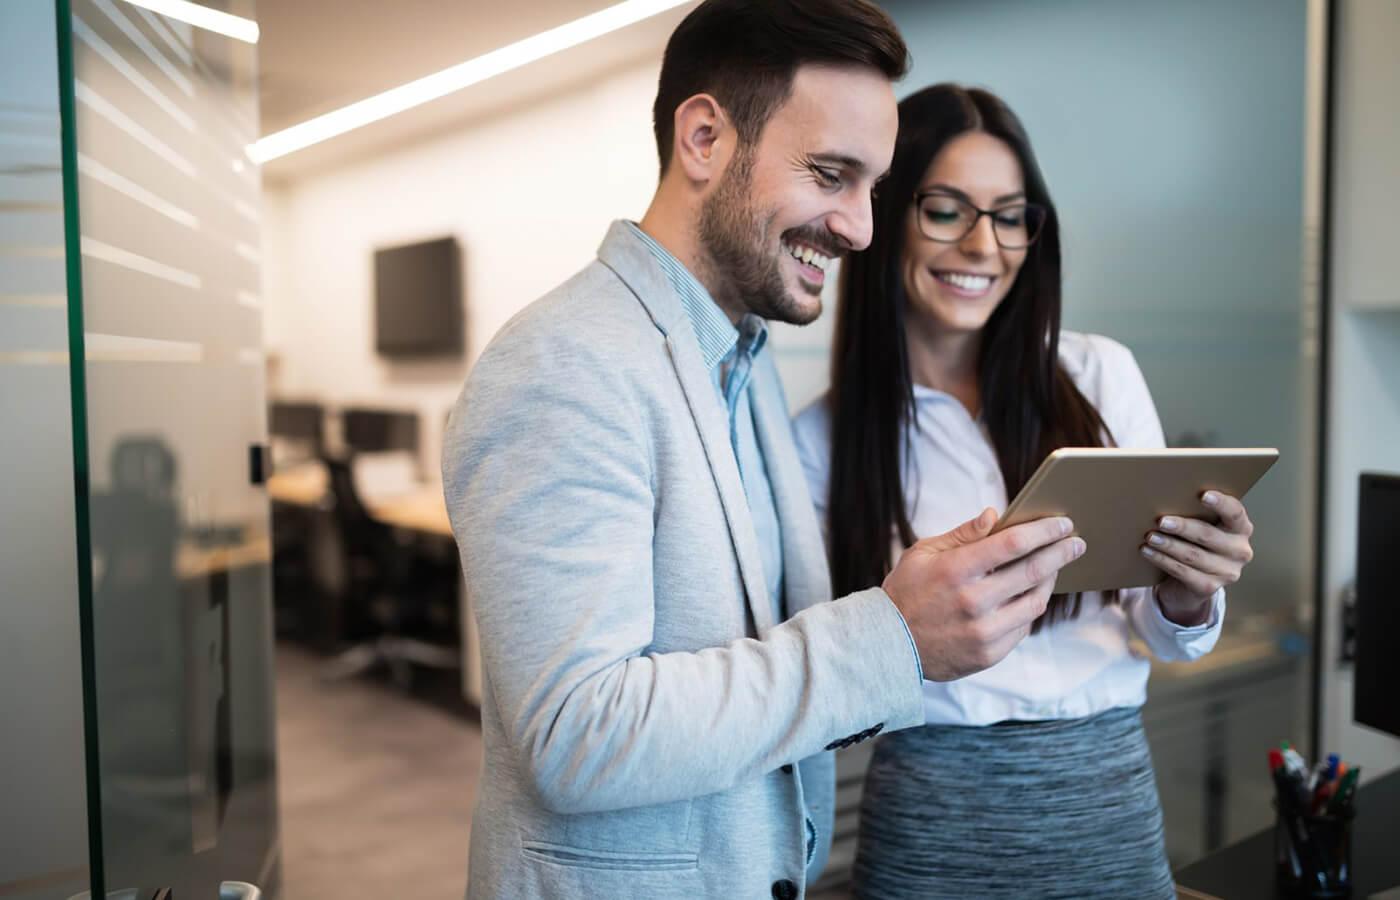 Managing The Gender Pay Gap